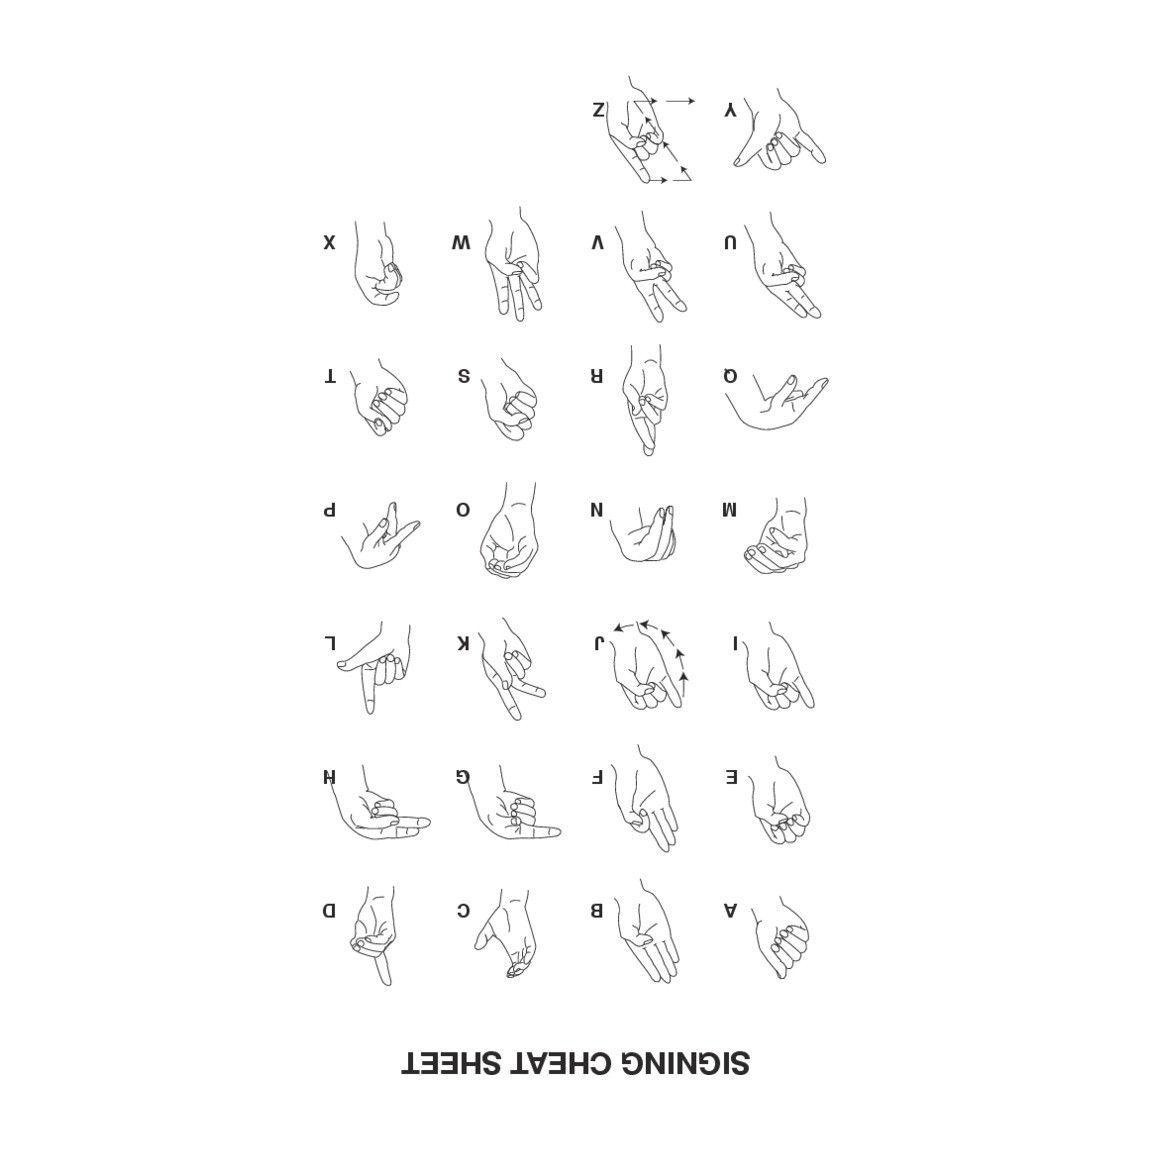 Alphabet Sign Language Cheat Sheet T-Shirt | Alphabet signs ...